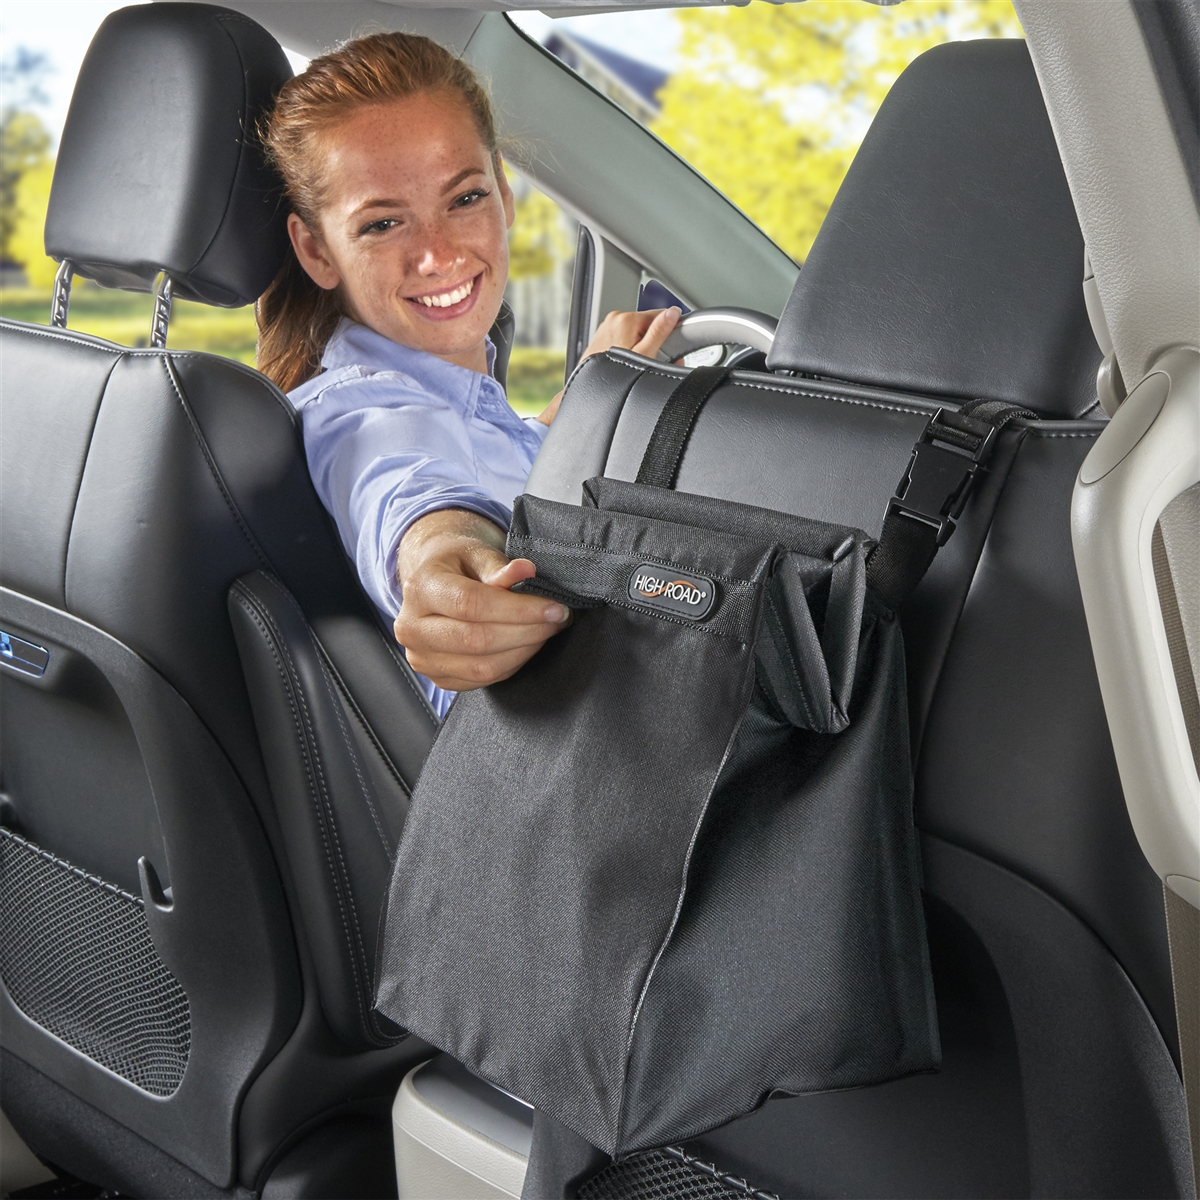 Baja High Road TrashStash Hanging Car Trash Bag with Leakproof Lining and Spring Closure